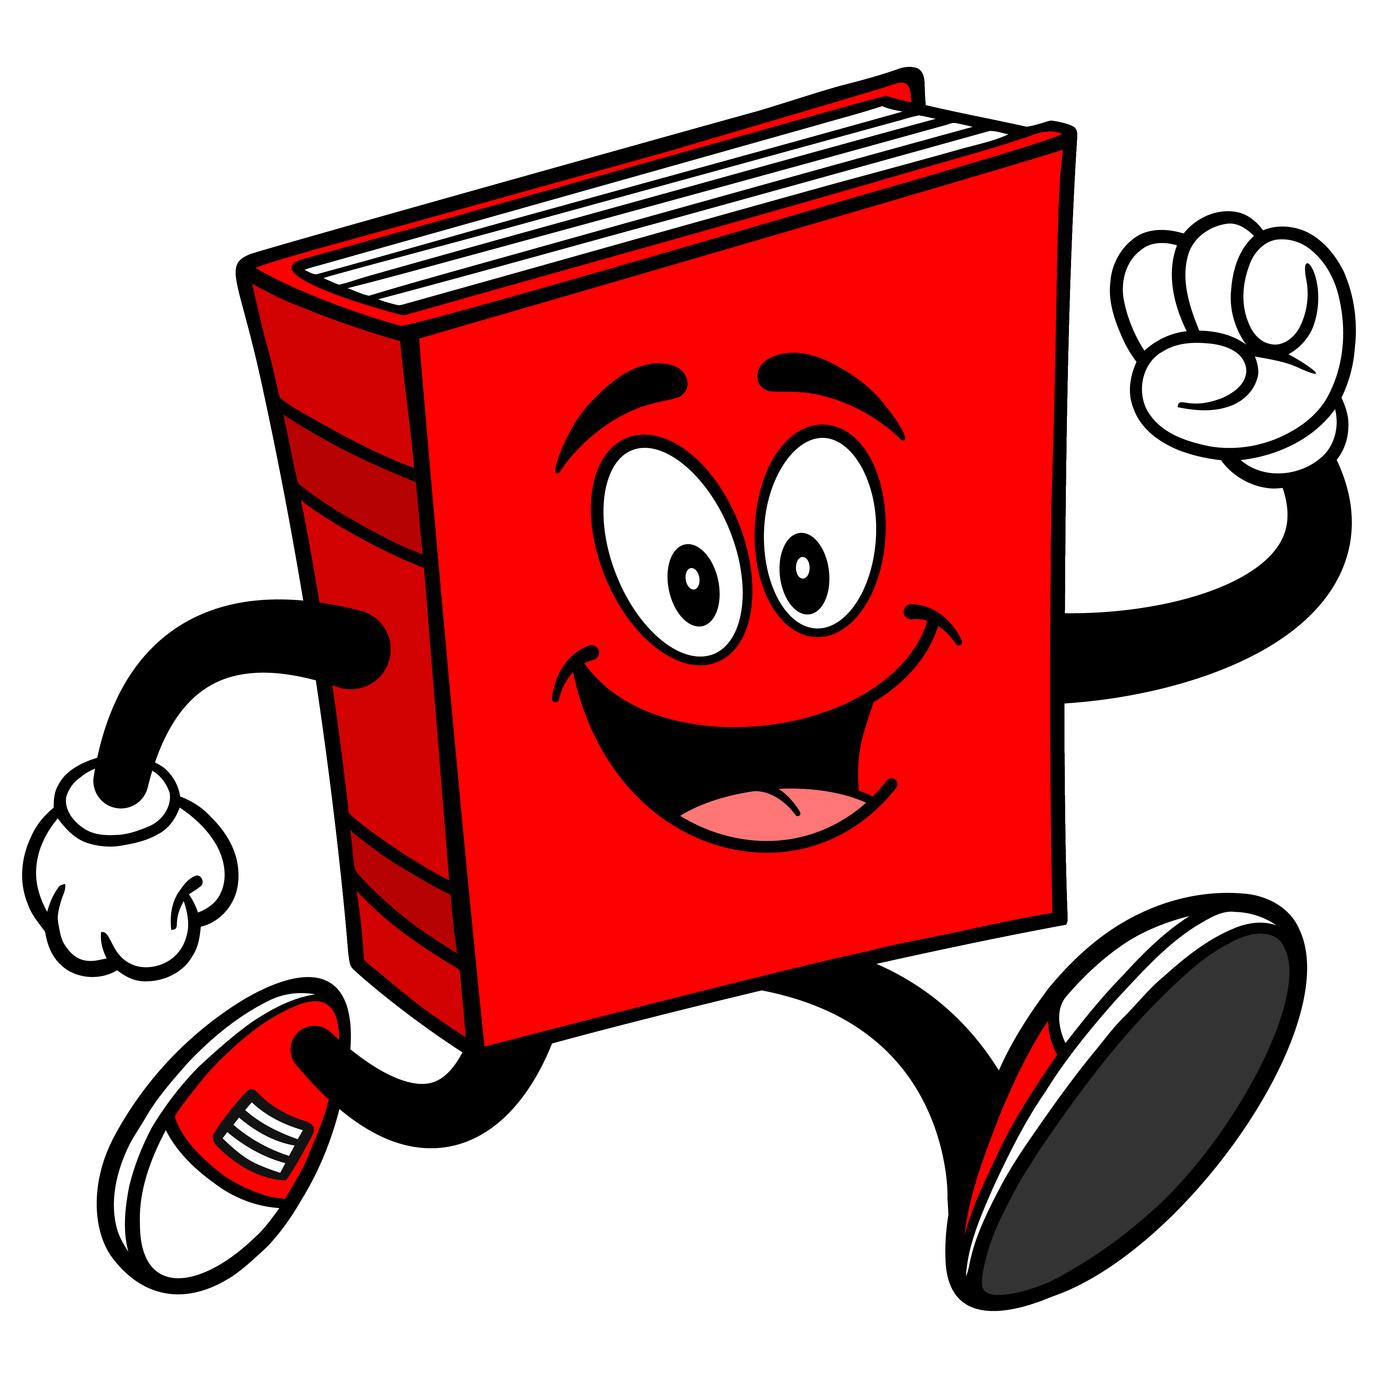 Book Cover Design Logo : Make or break how unique logos help your book cover